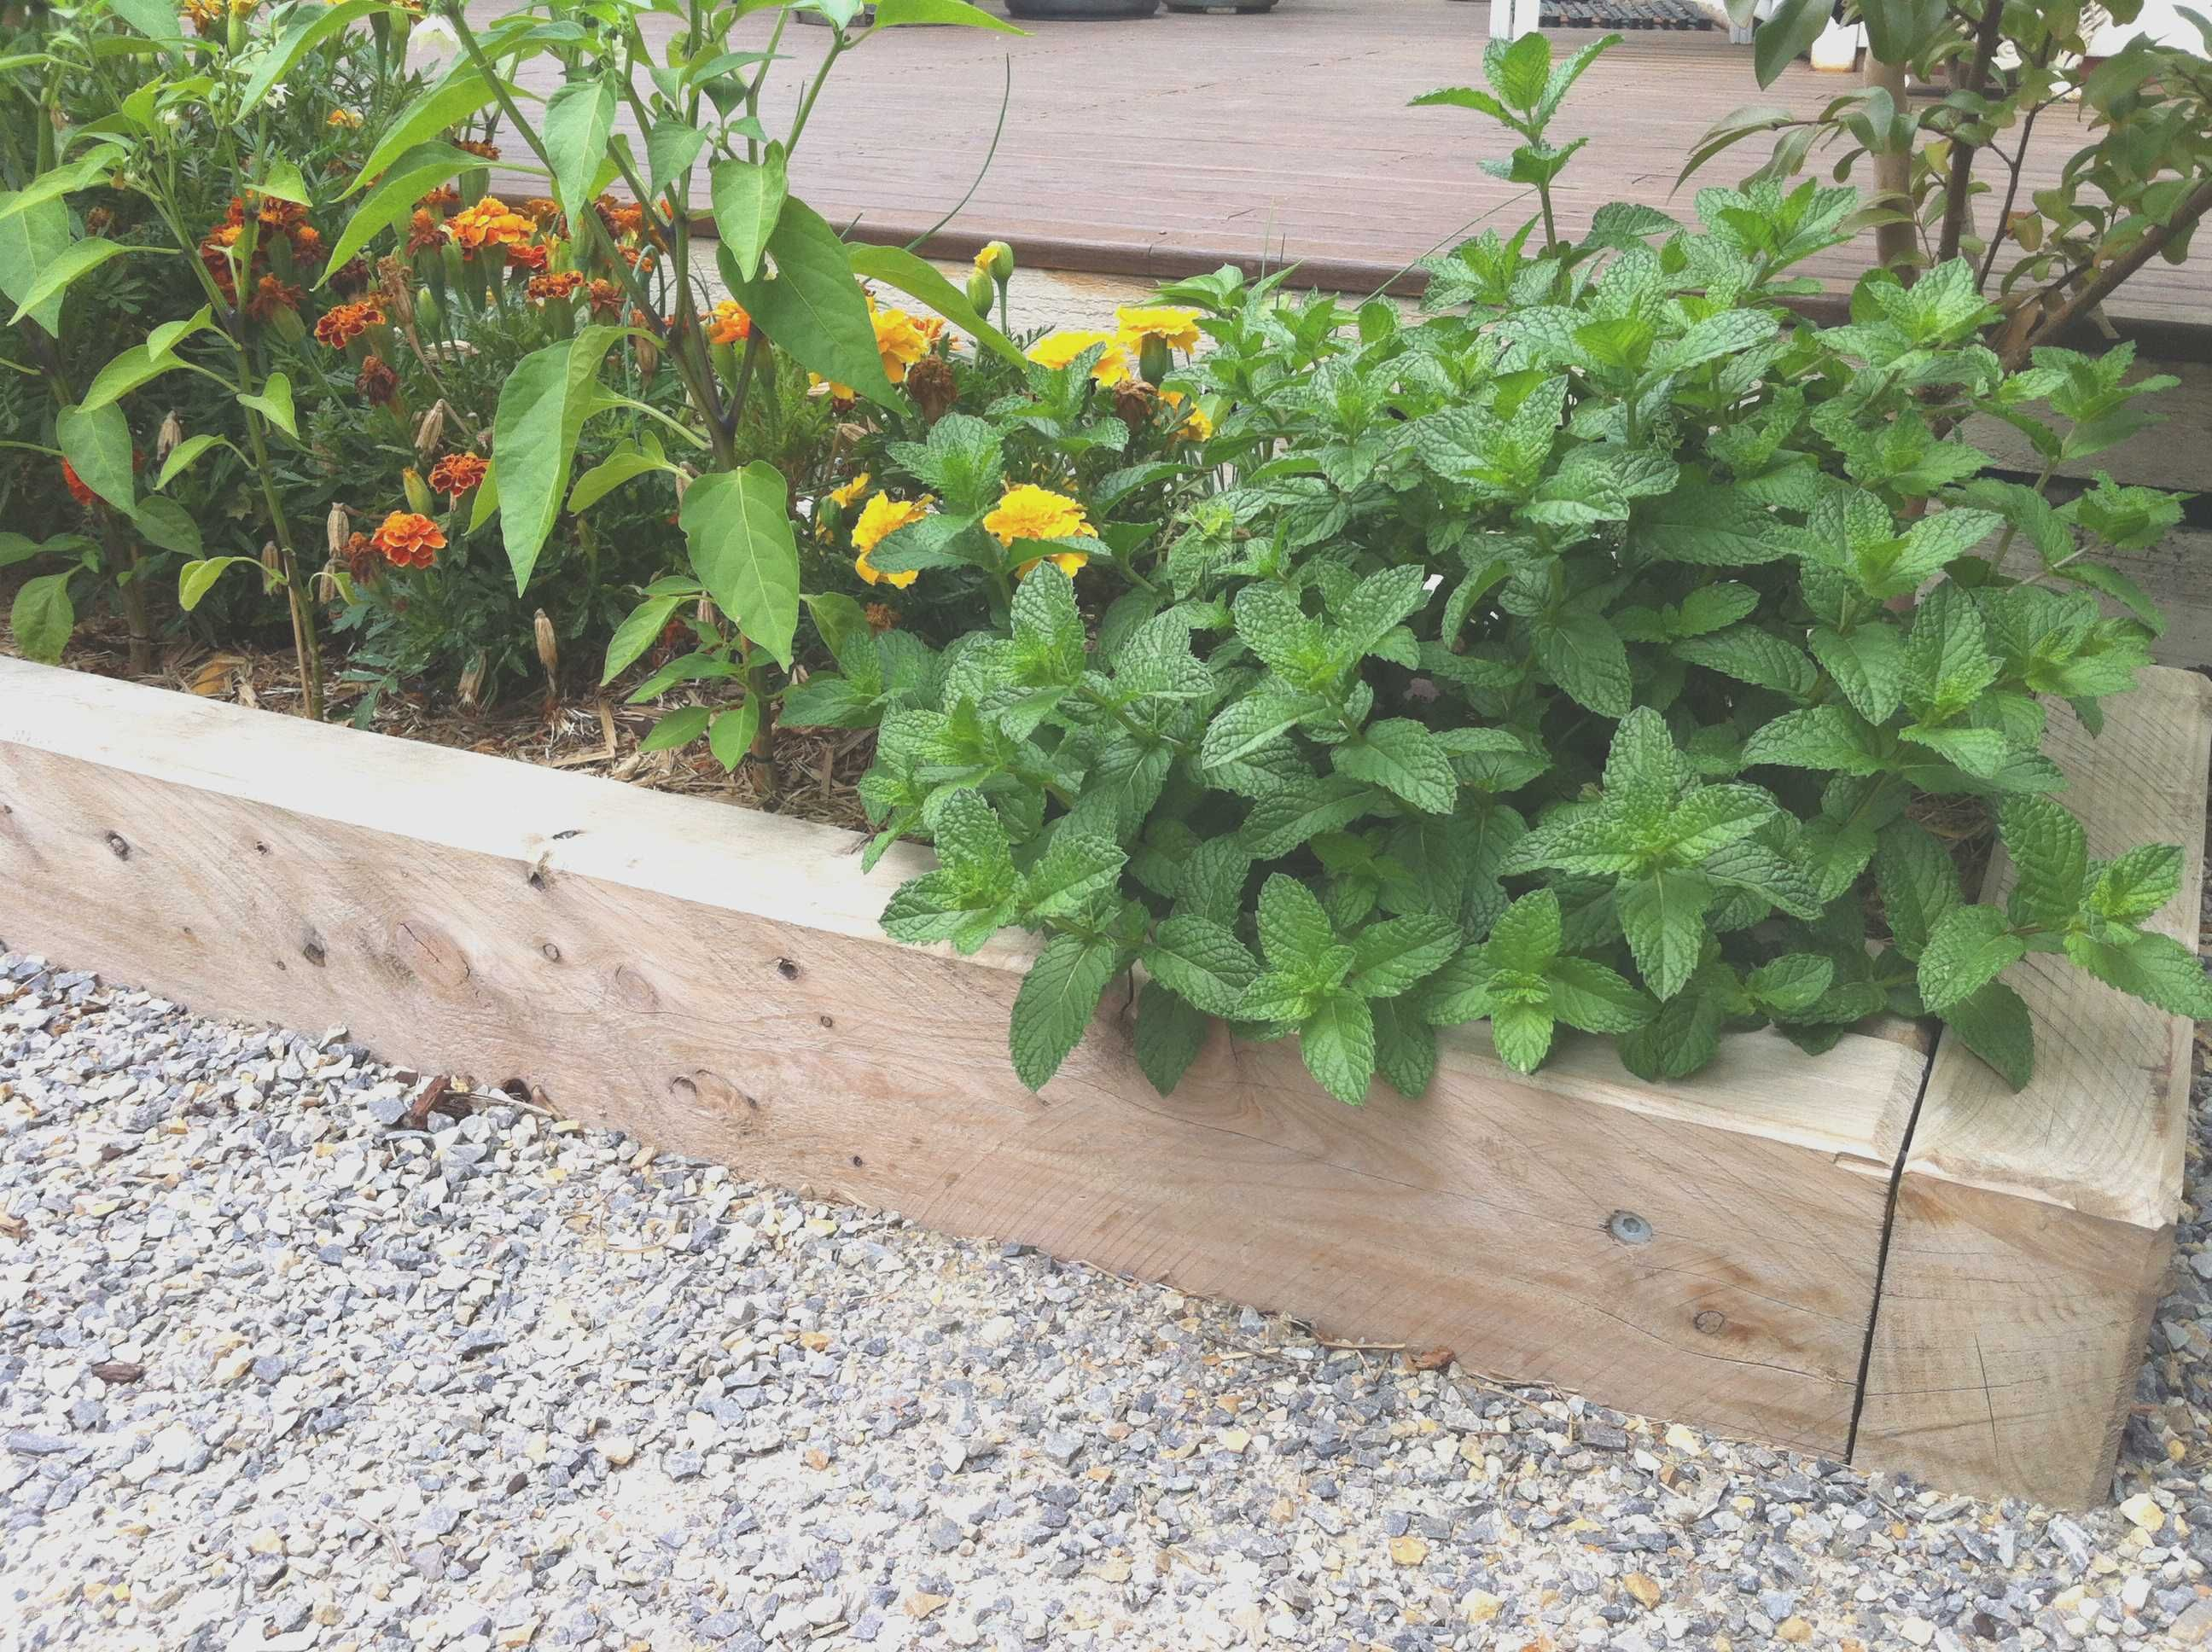 Inspirational Vegetable Garden Plans for Small Spaces | Garden ...